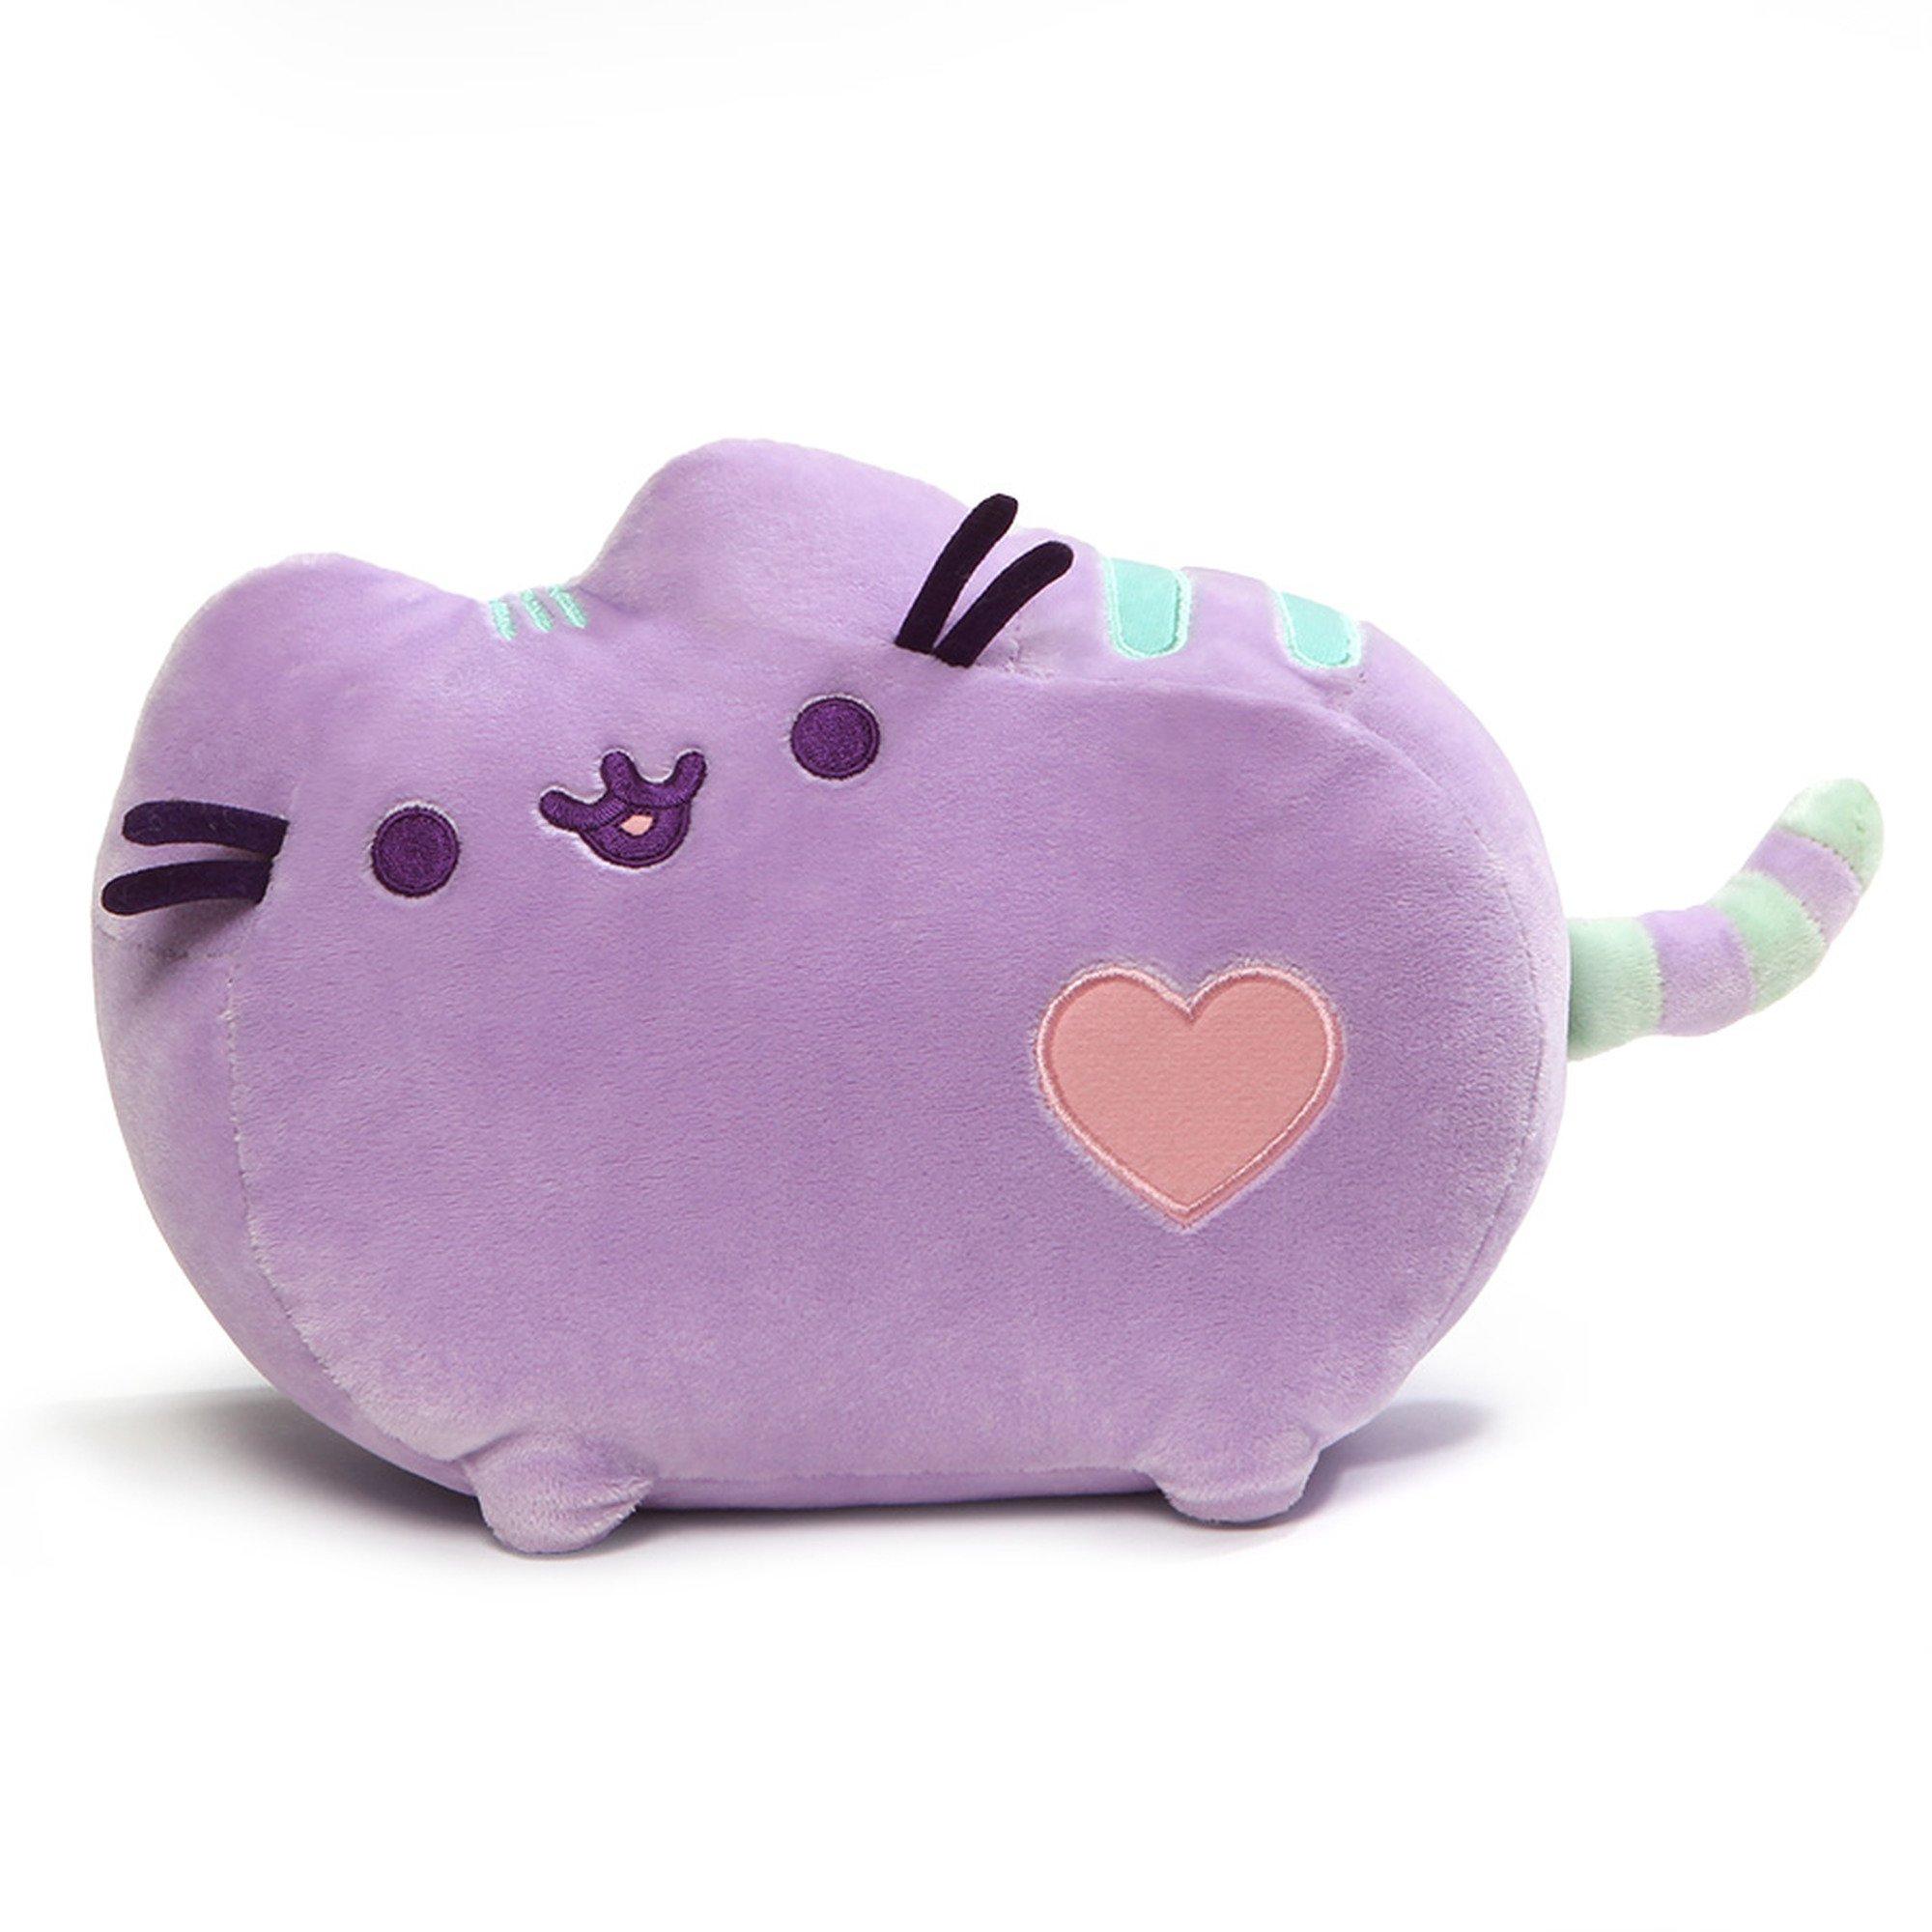 GUND Pusheen Heart Pastel Cat Plush Stuffed Animal, Purple, 12'' by GUND